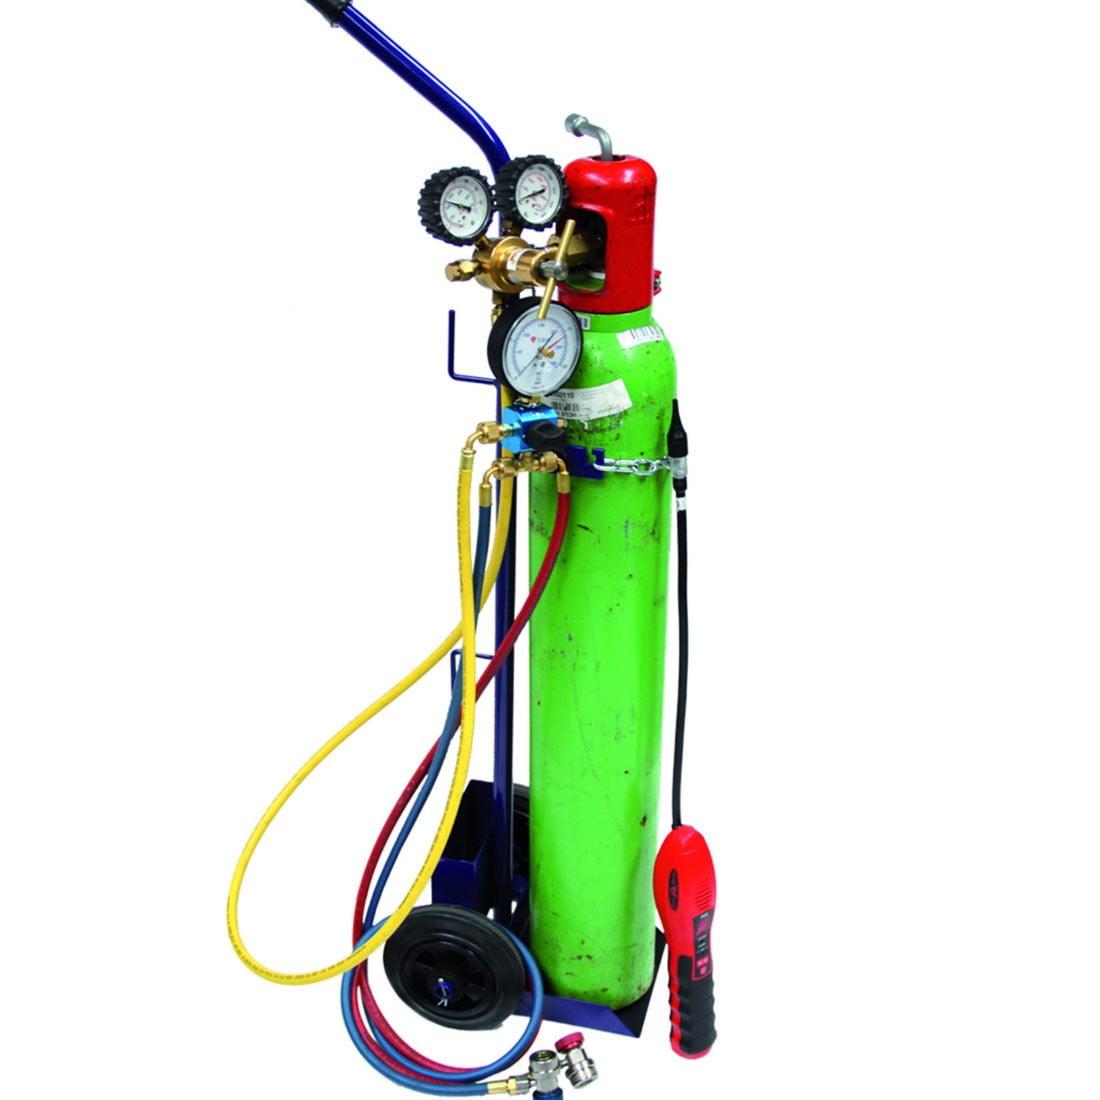 nitrogen-leak-tester-complete